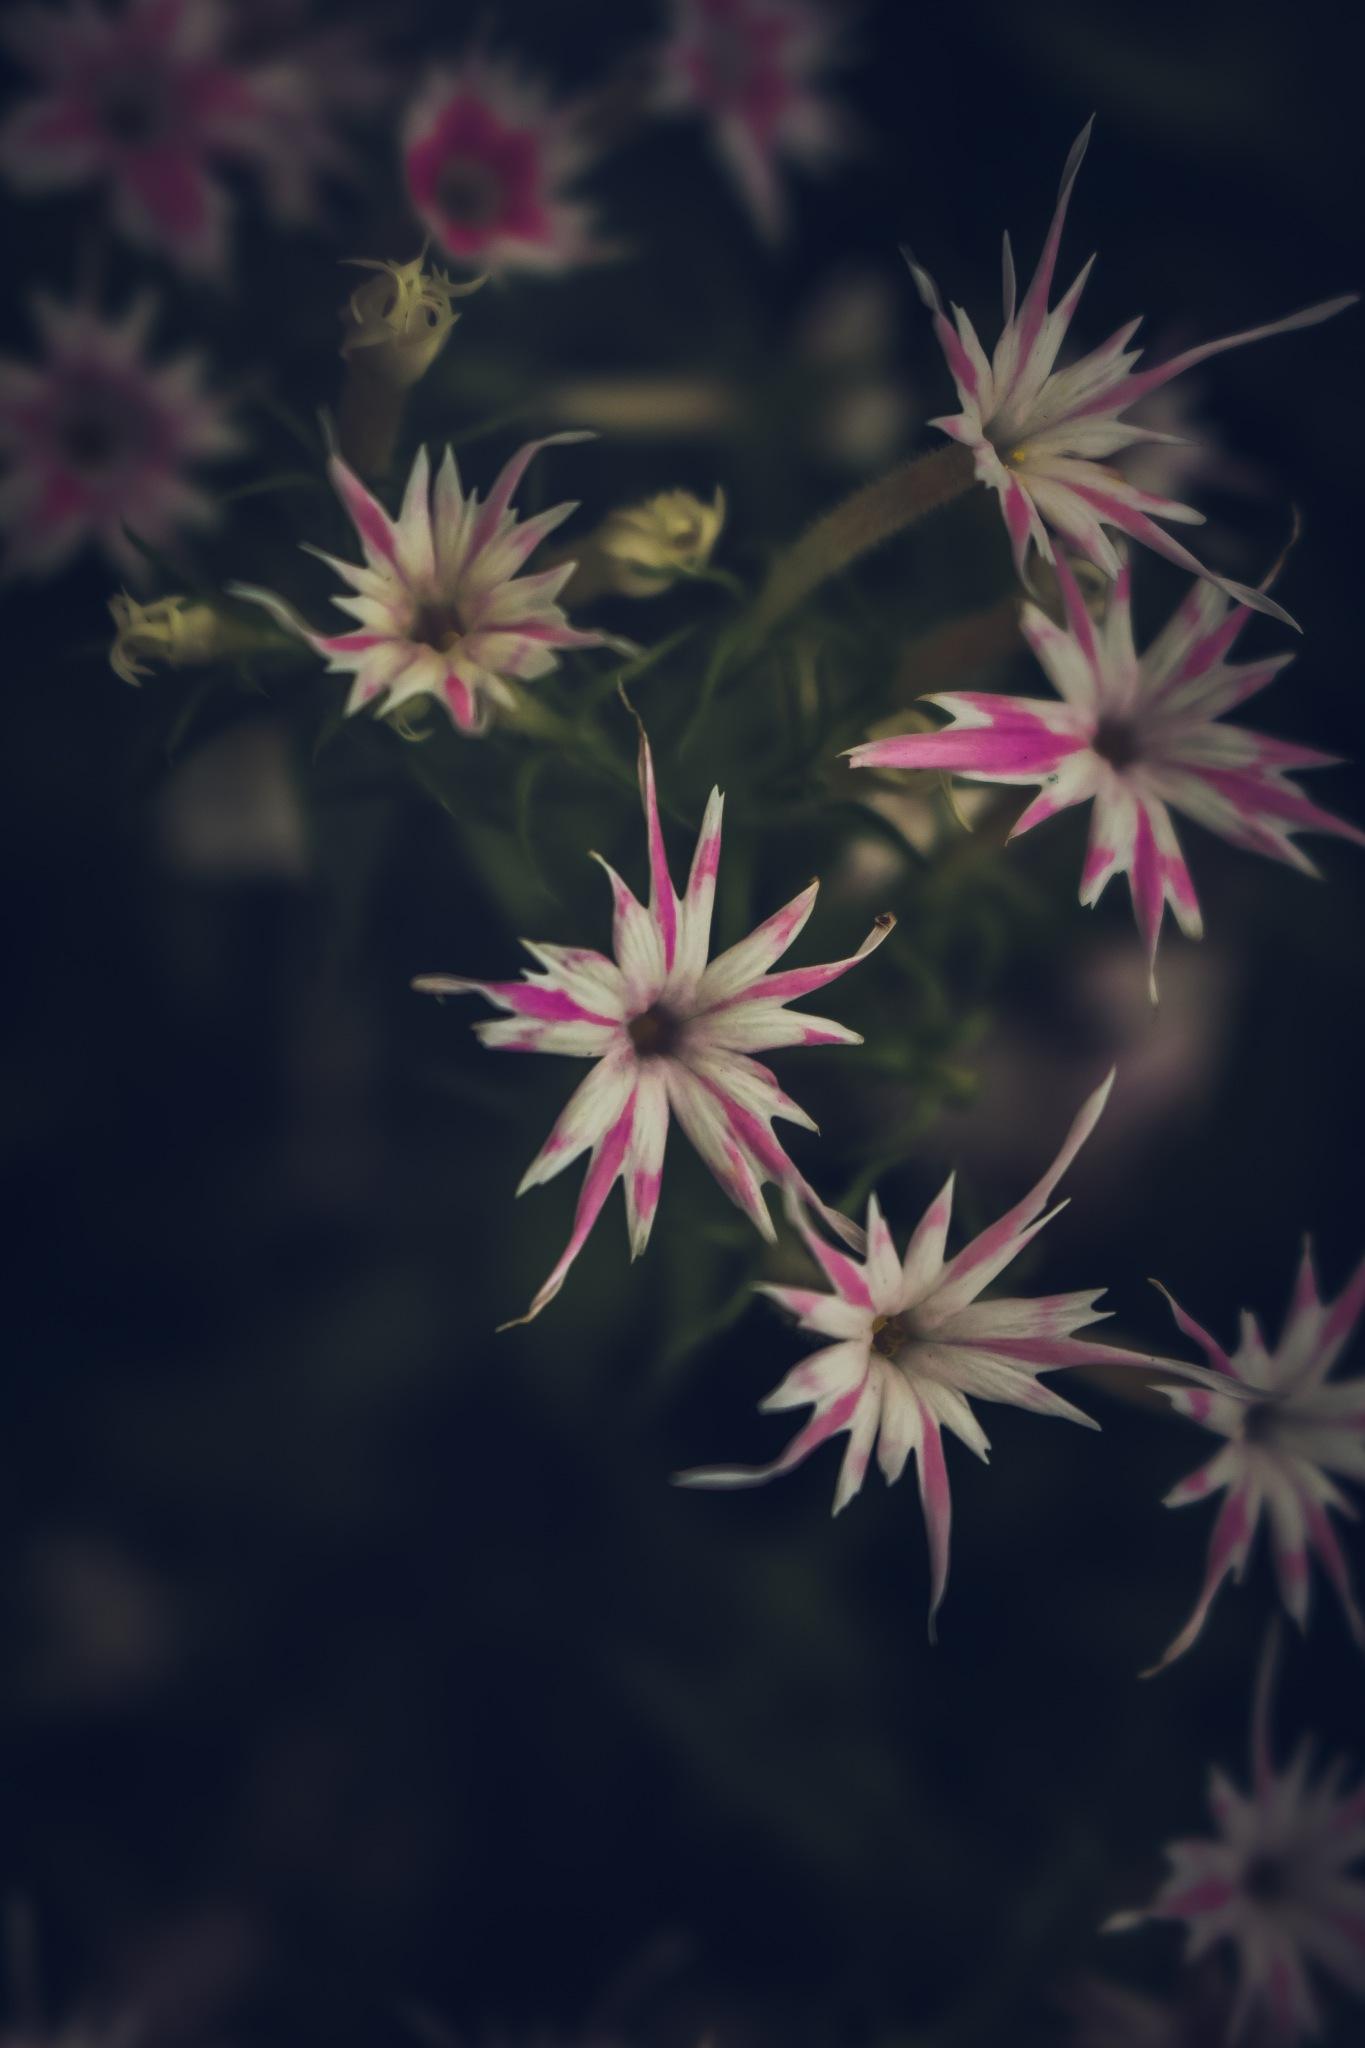 Flower by Annsmith